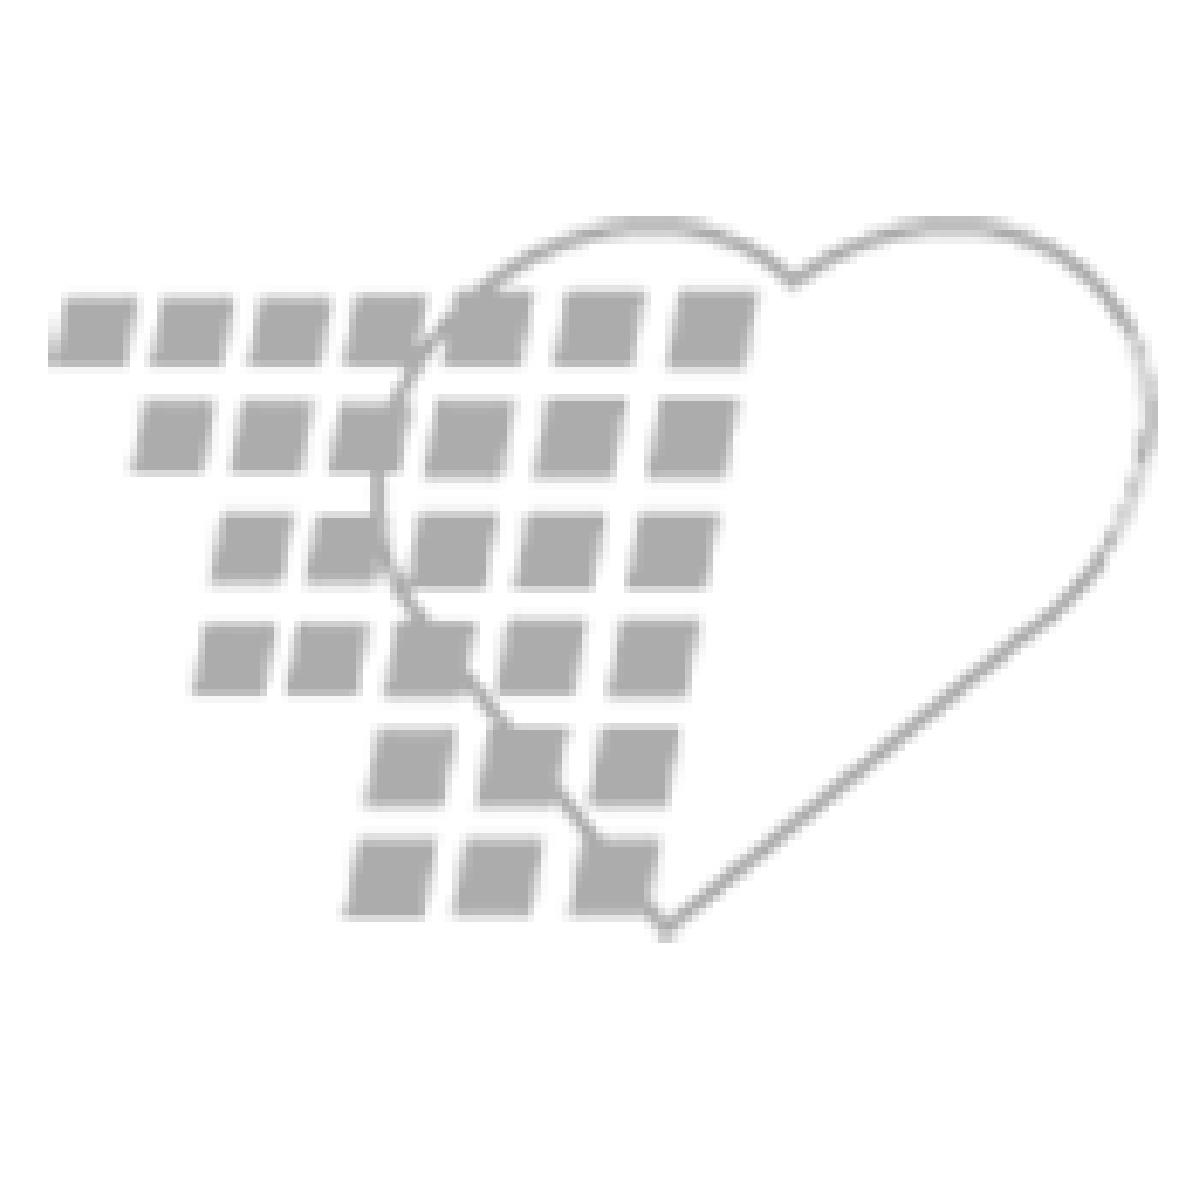 09-83-1703 - Laerdal SkillGuide (New)